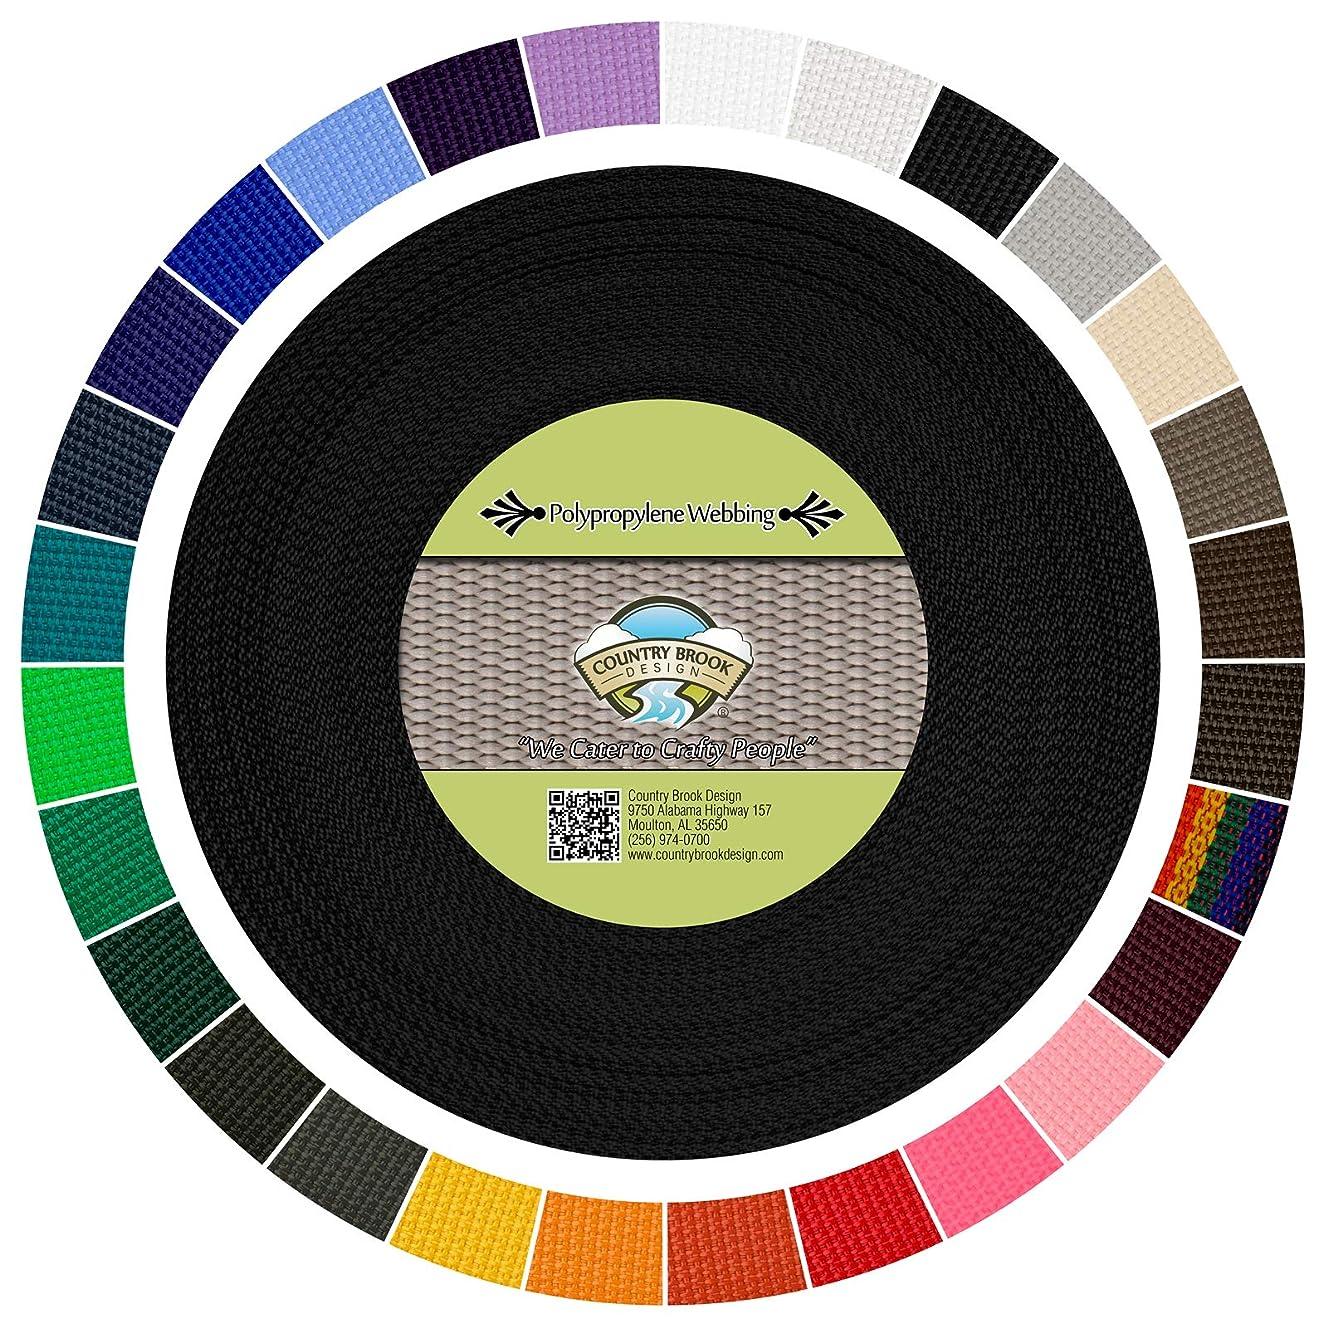 Country Brook Design | Polypropylene Webbing (1 Inch) (Black, 50 Yards)